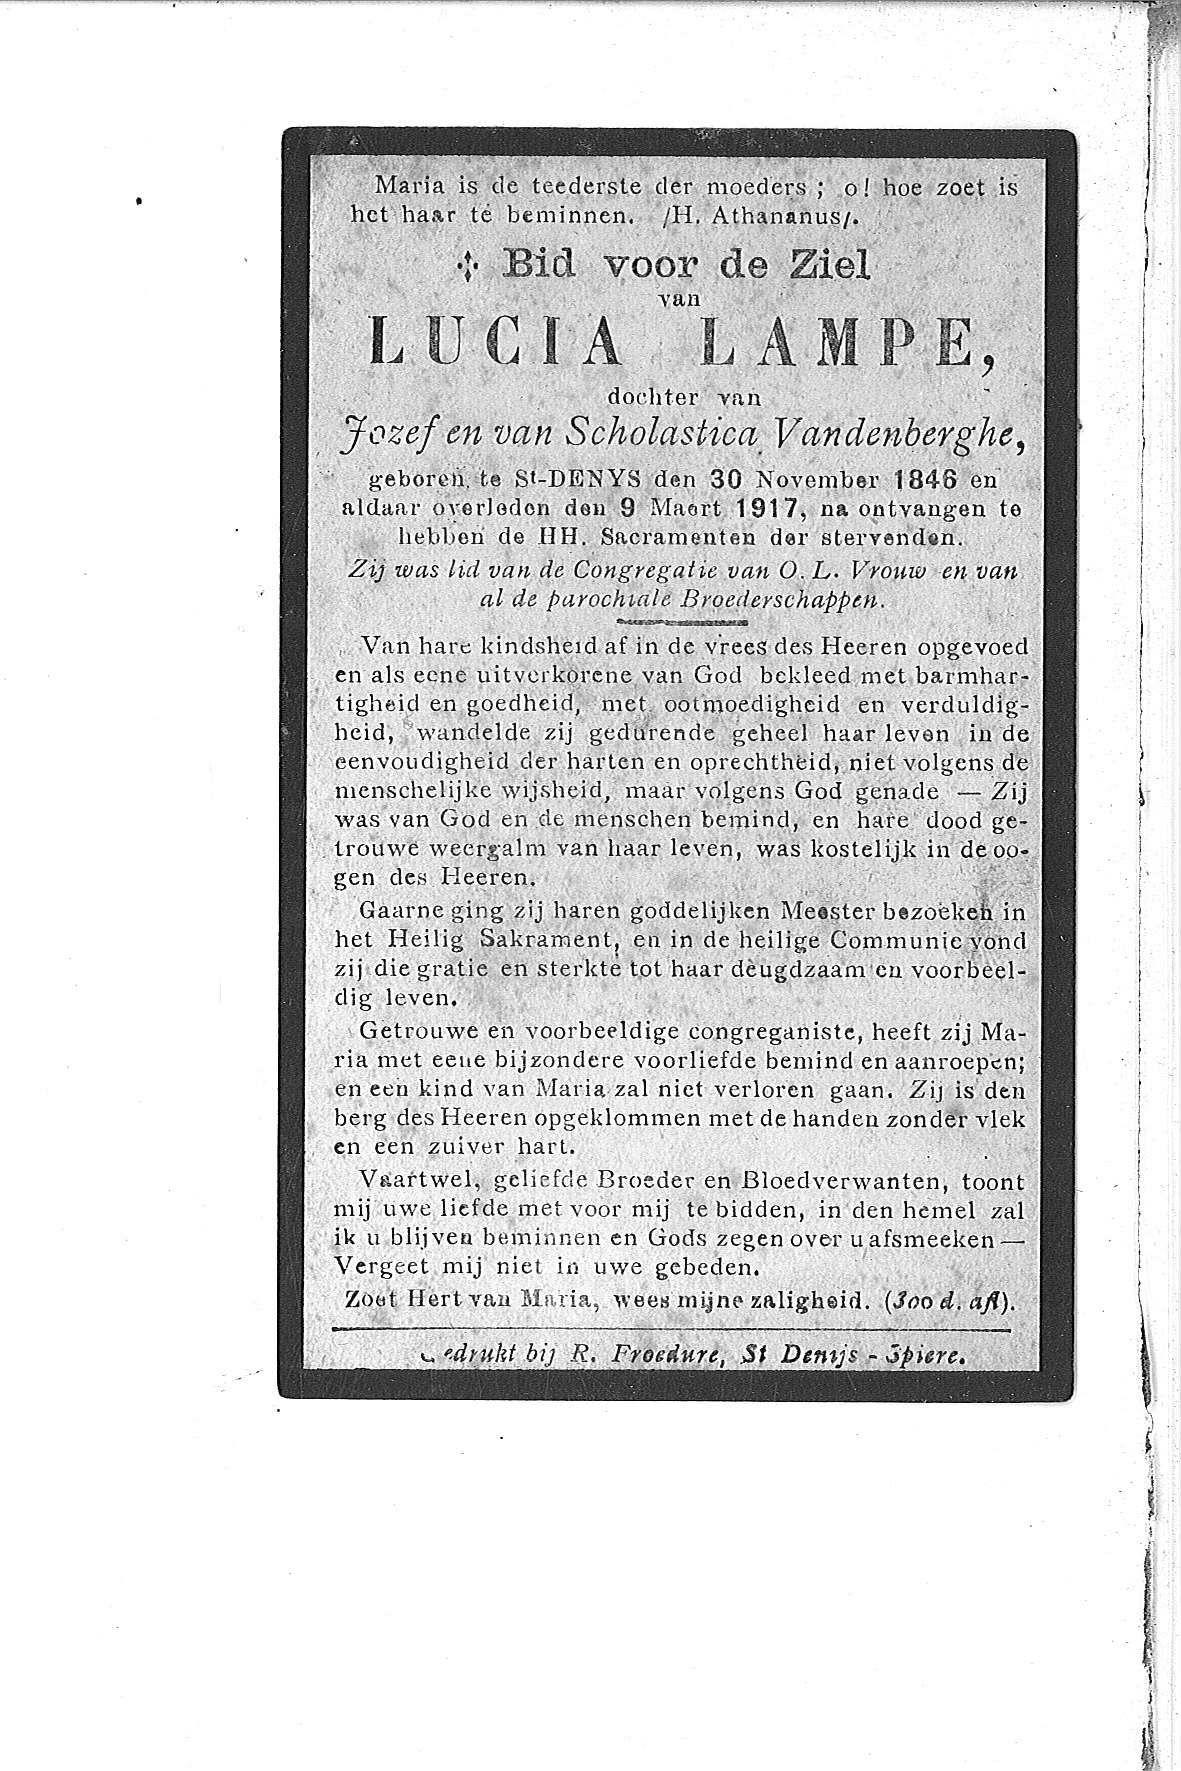 Lucia(1917)20110816140049_00008.jpg